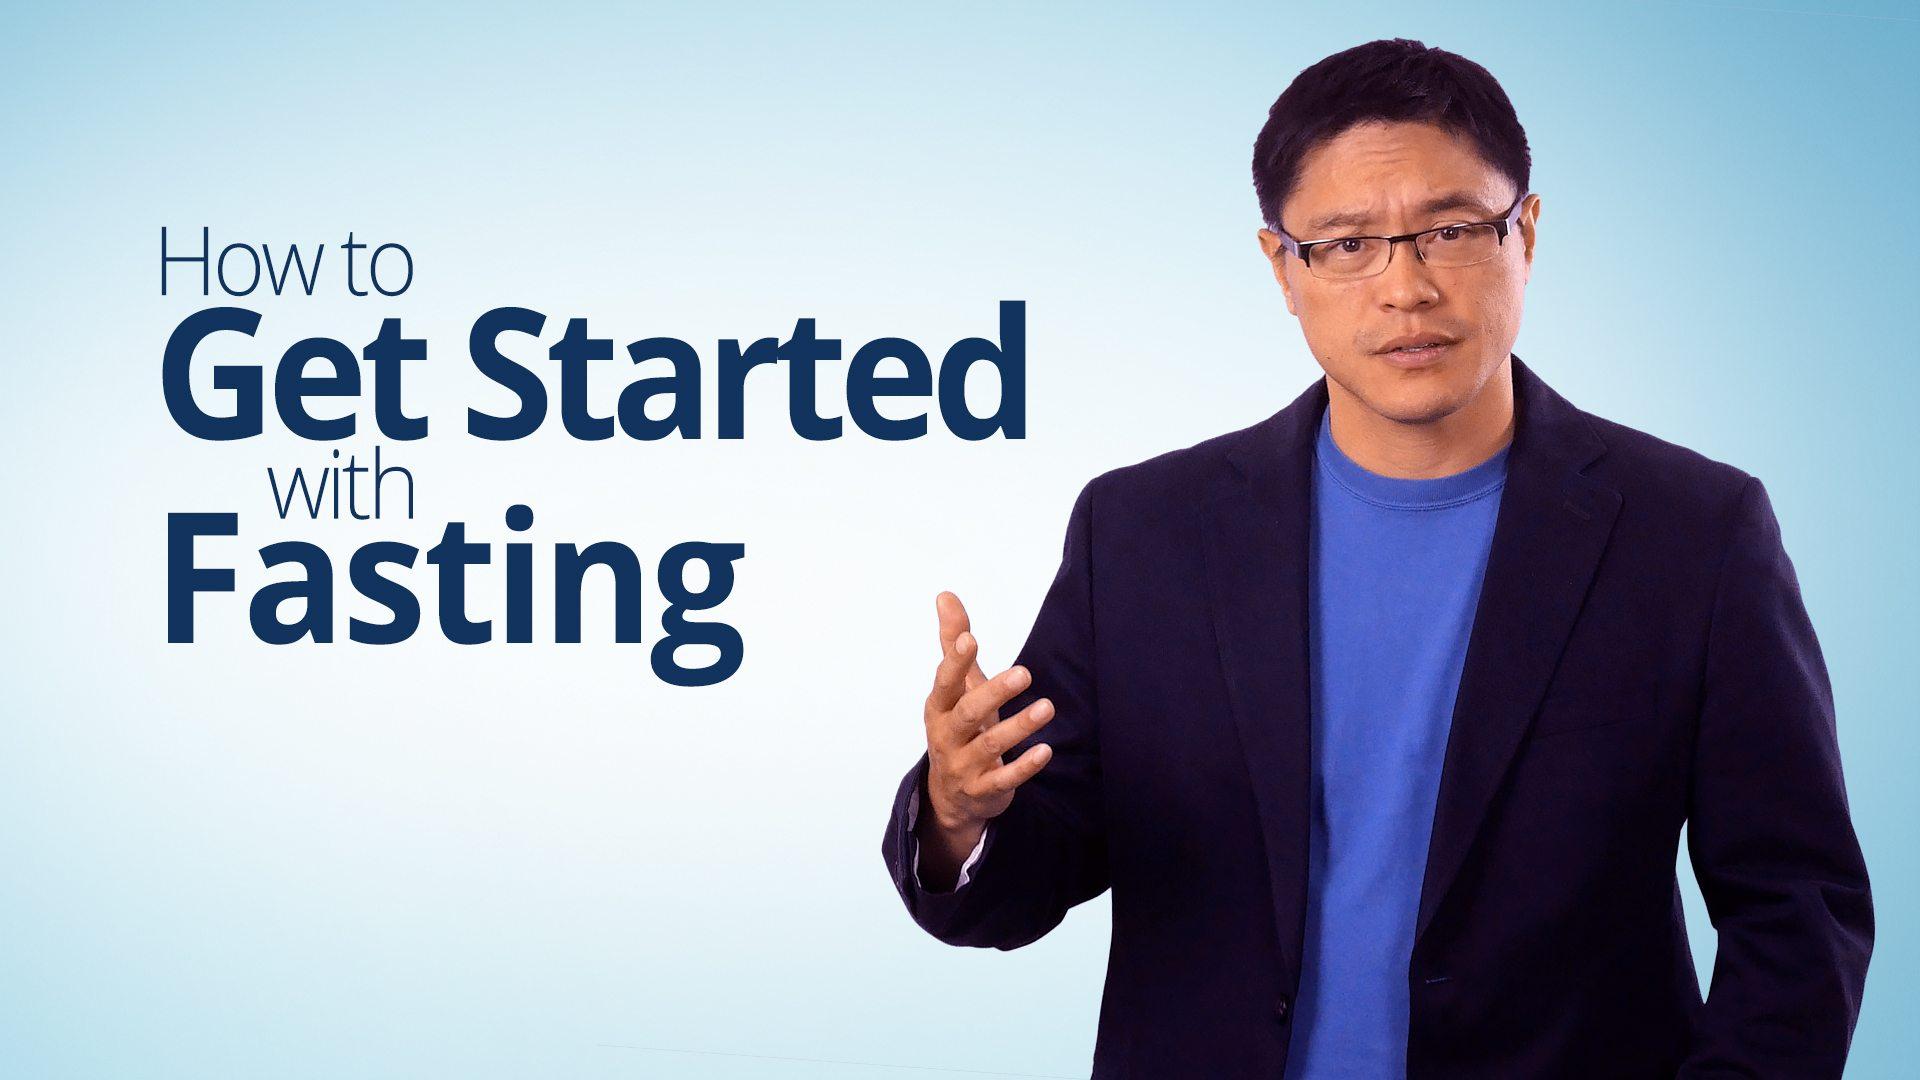 GetStartedWithFasting-JasonFung